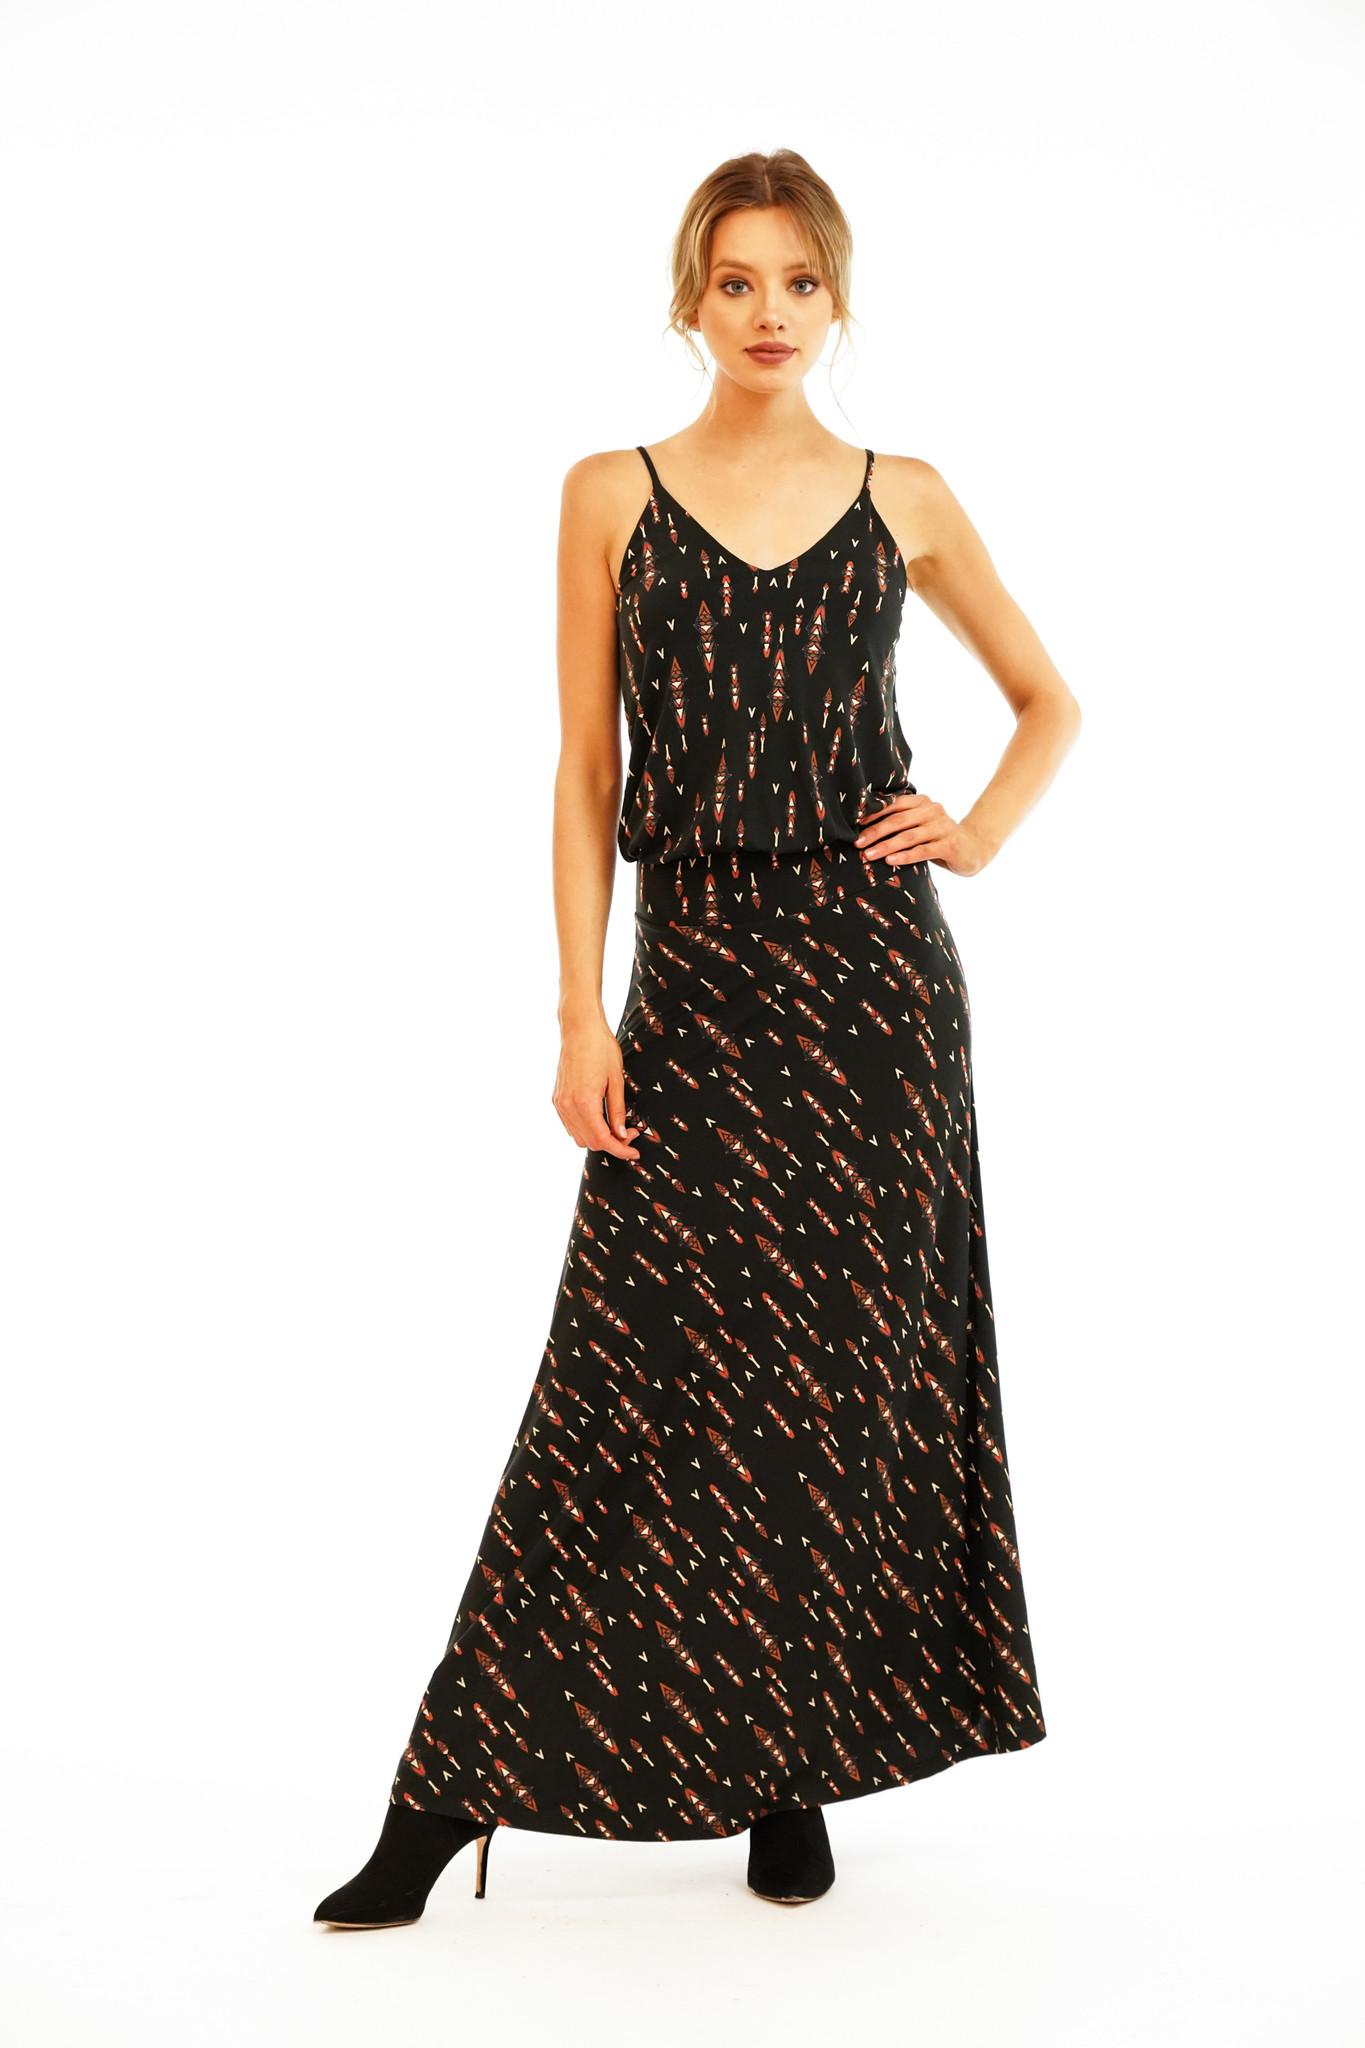 Veronica M Veronica M Drop Waist Maxi Dress